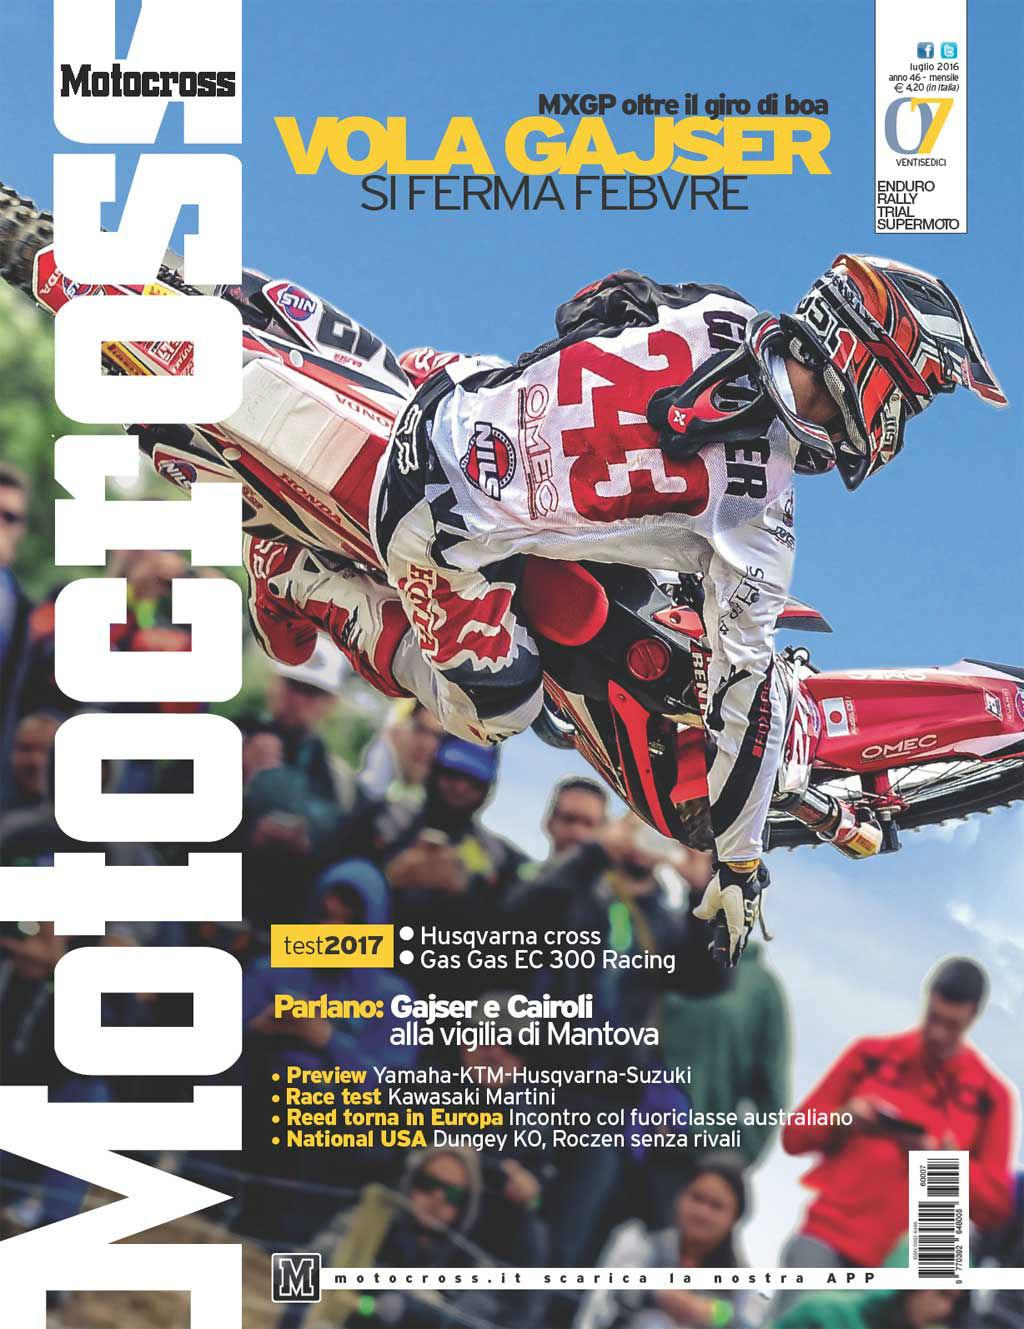 Motocross Luglio 2016